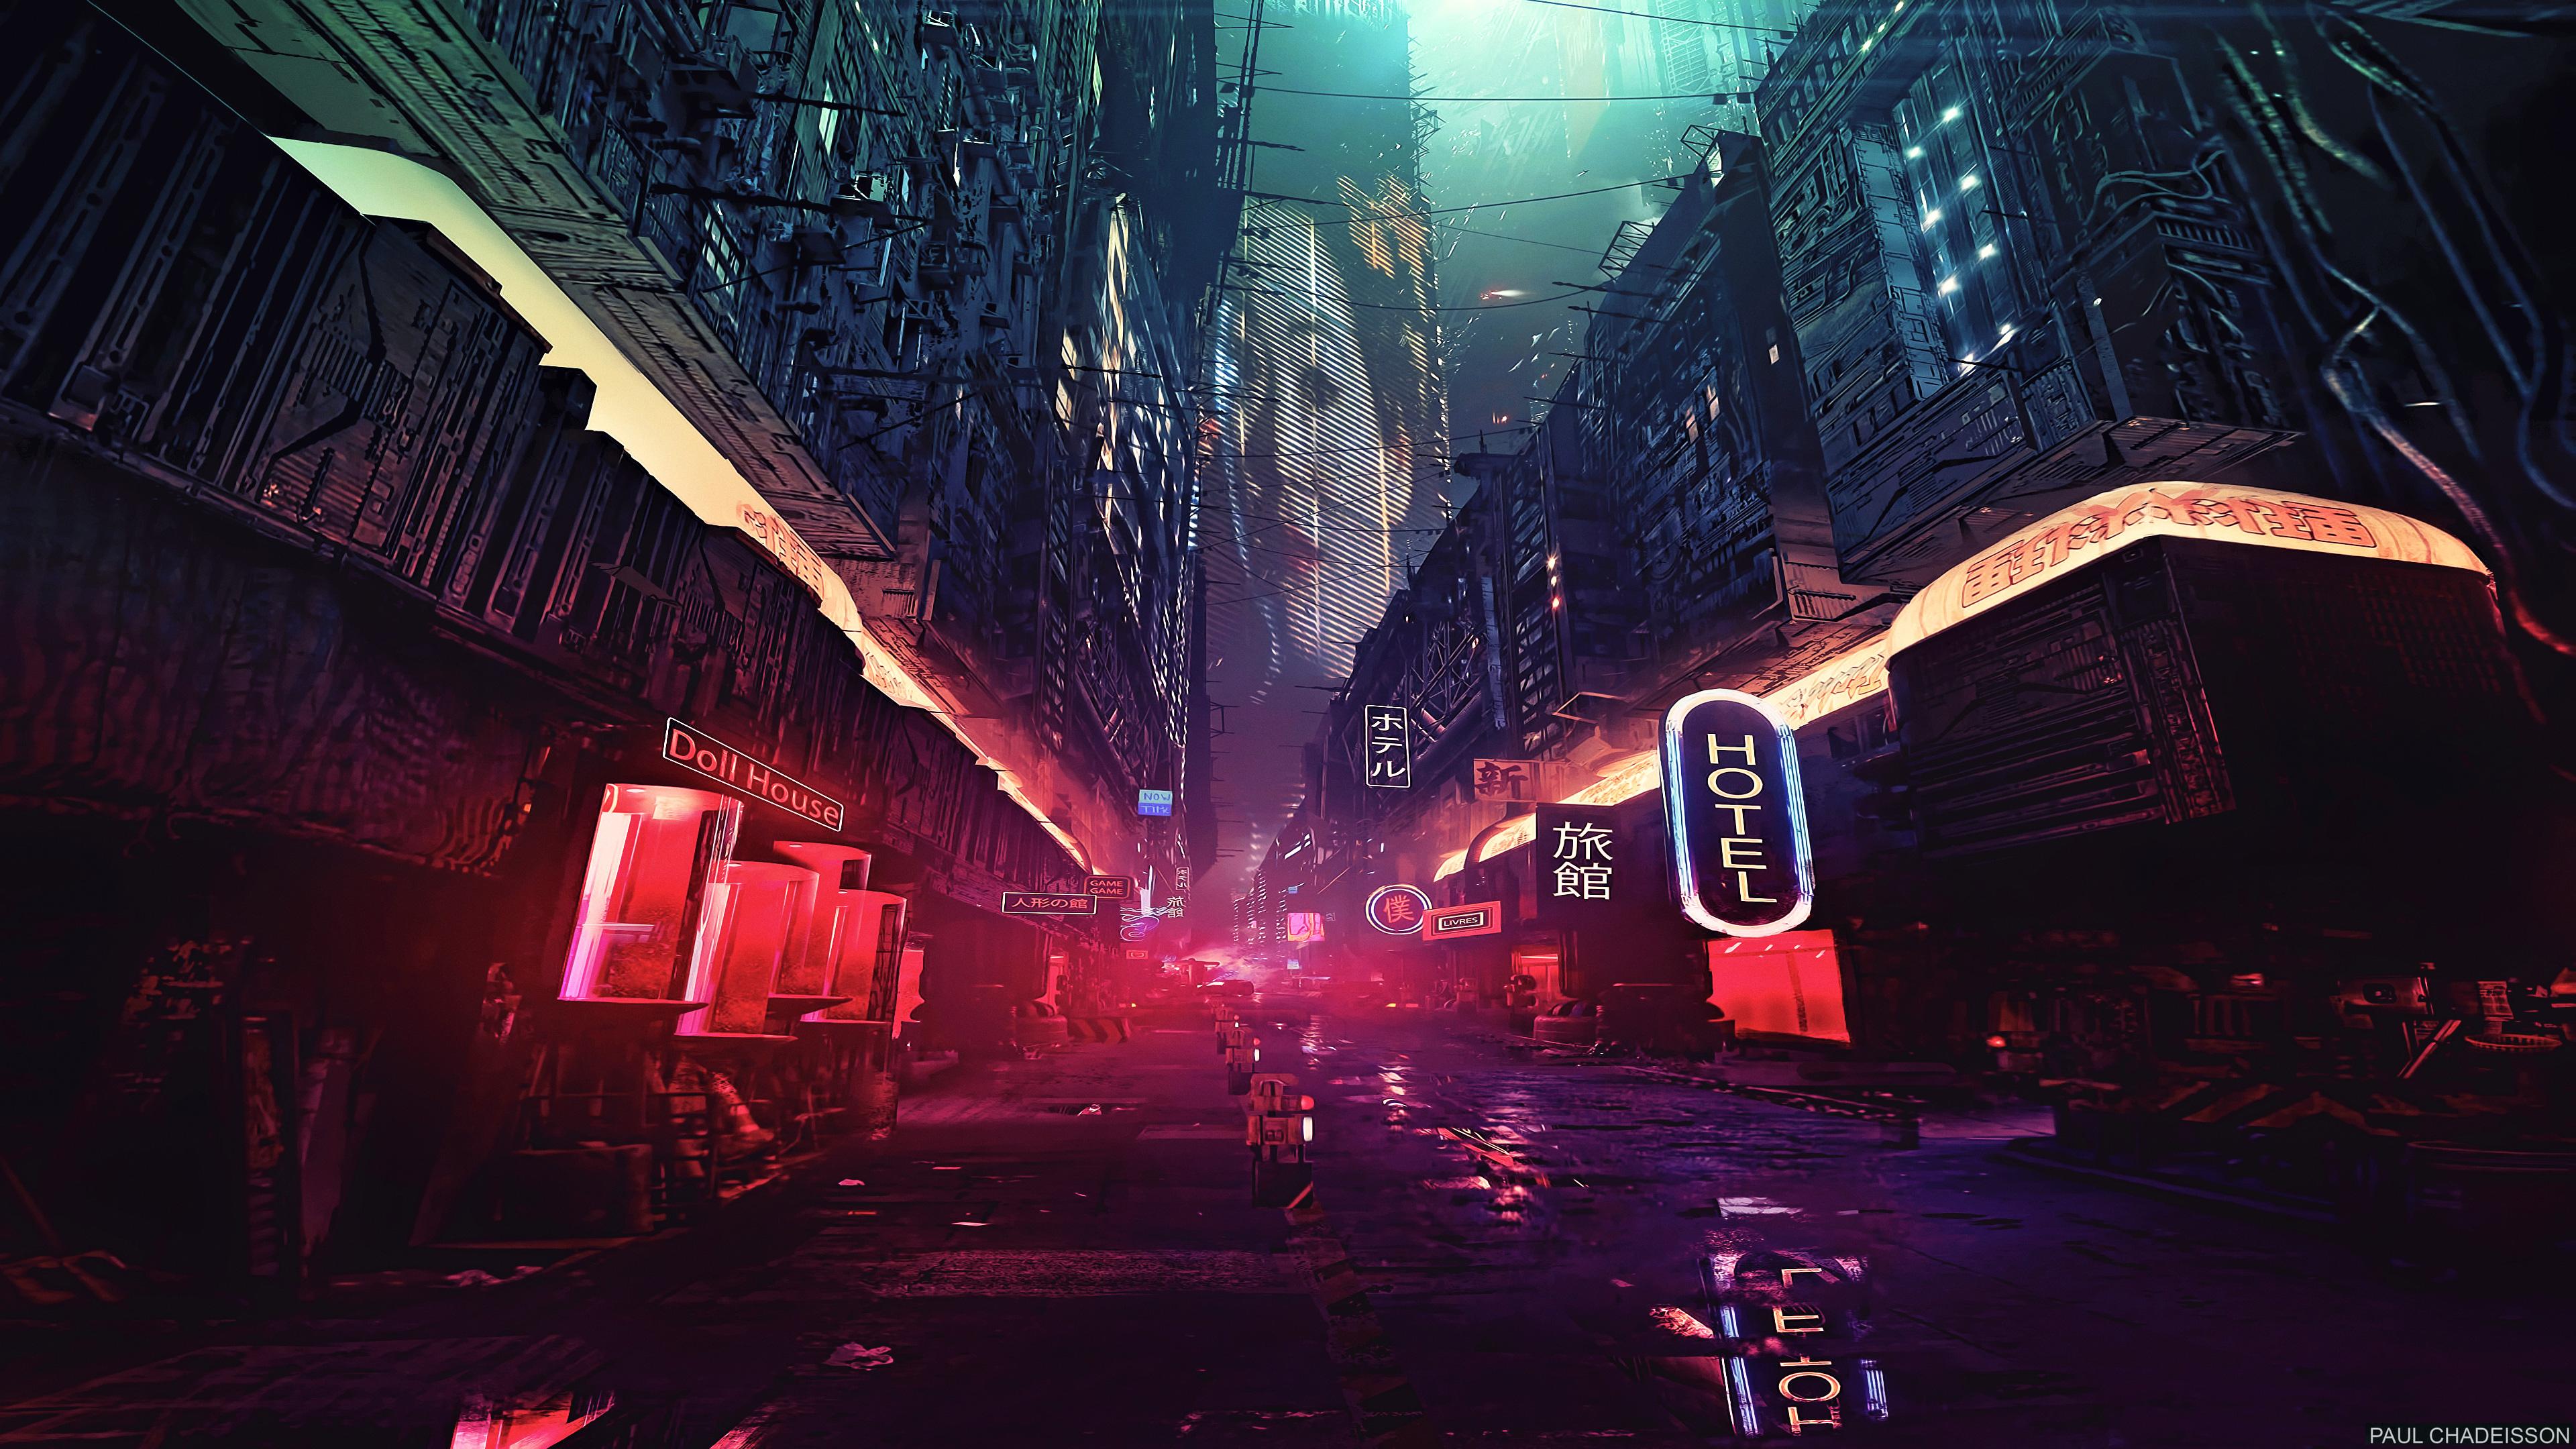 futuristic city science fiction concept art digital art, hd artist